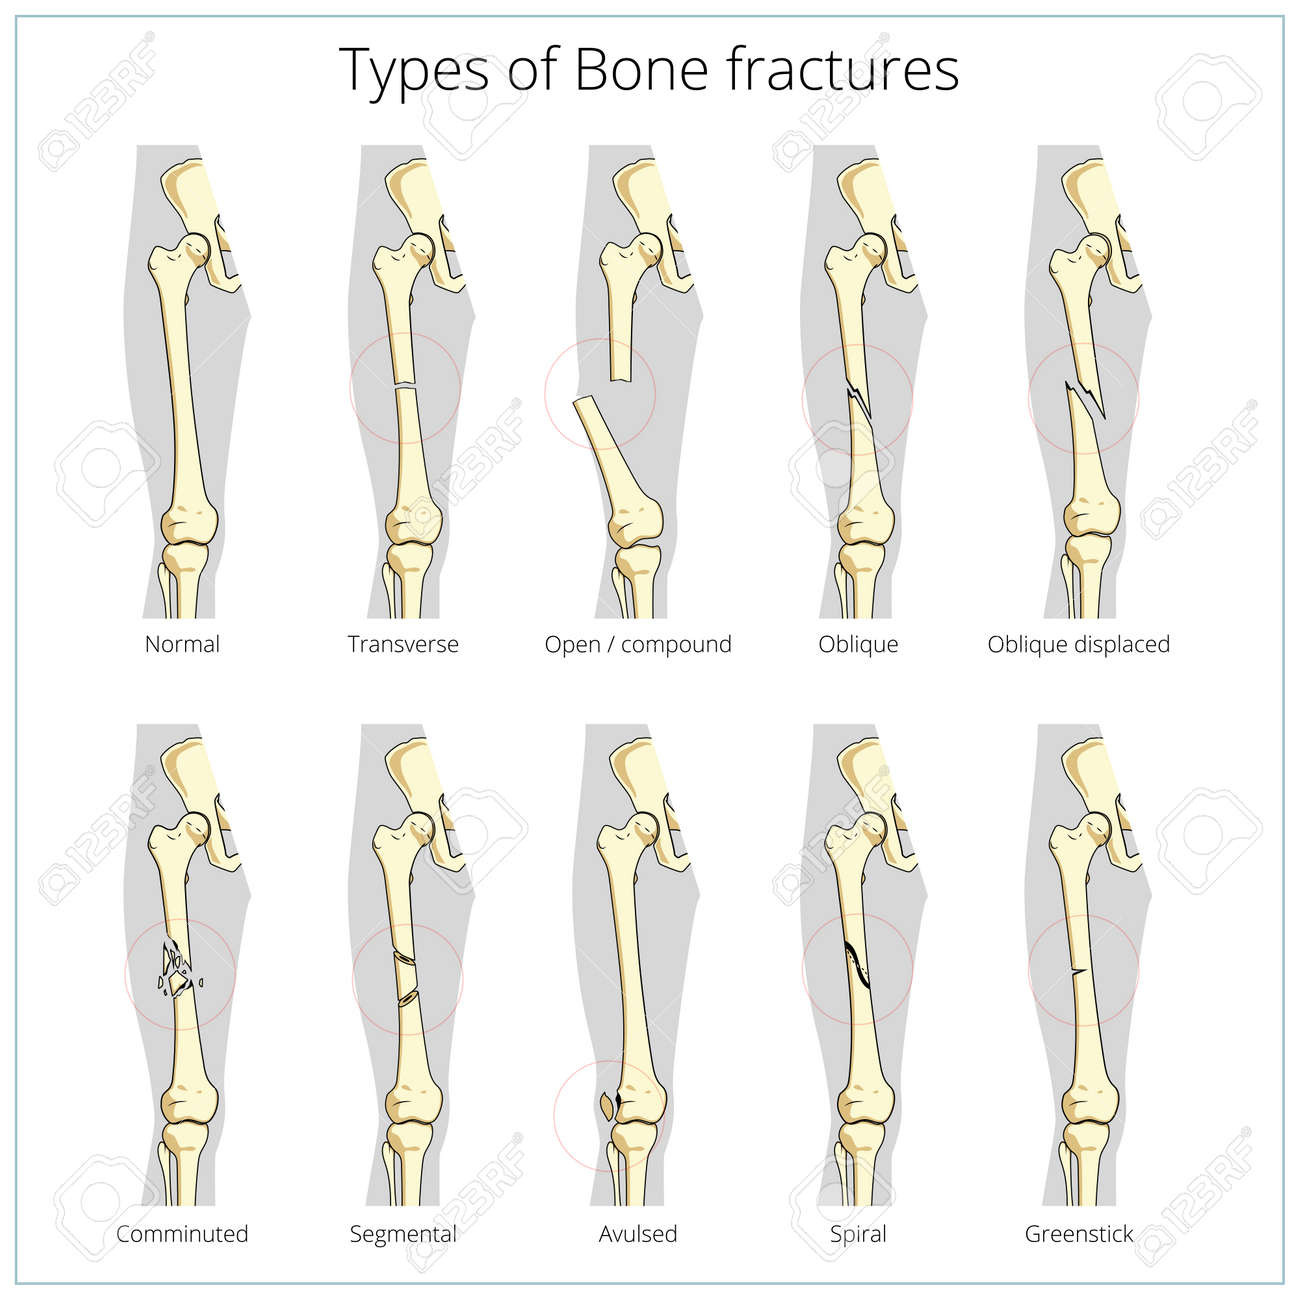 Tipos De Fracturas óseas Anatomía Esqueleto Médico Ilustración ...